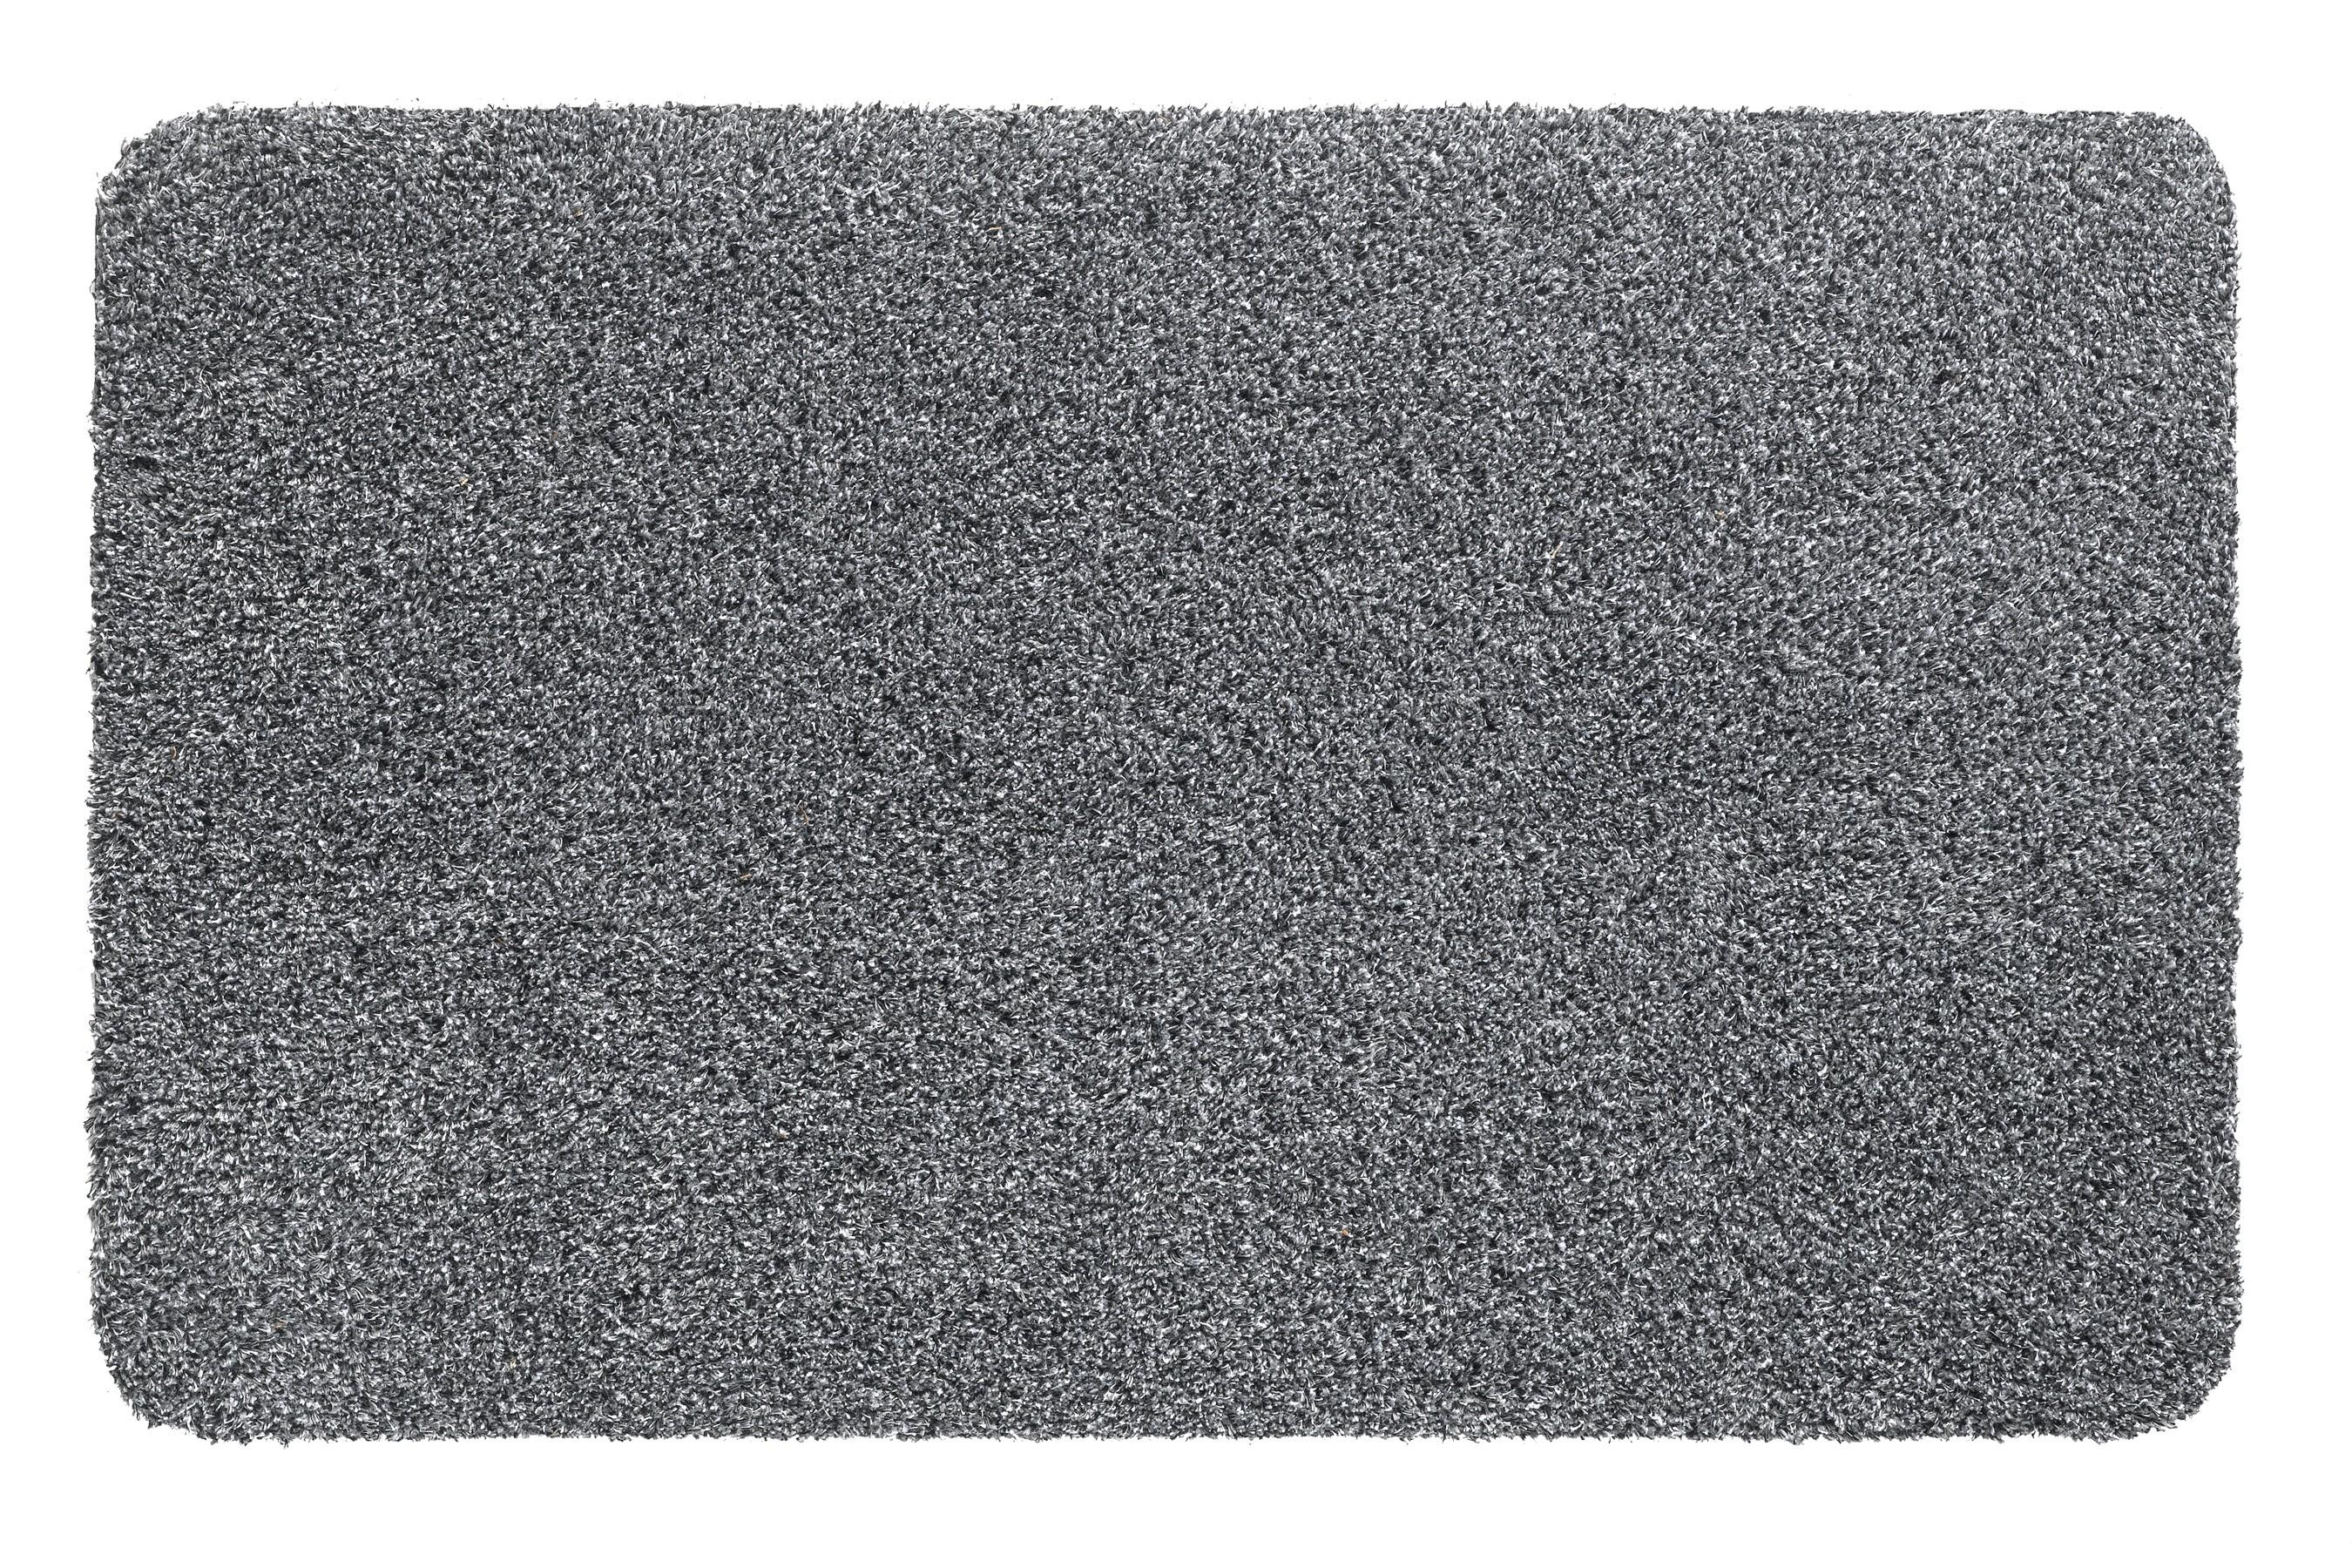 Hamat Fußmatte Aqua Stop waschbar 40x60cm grey Bild 1